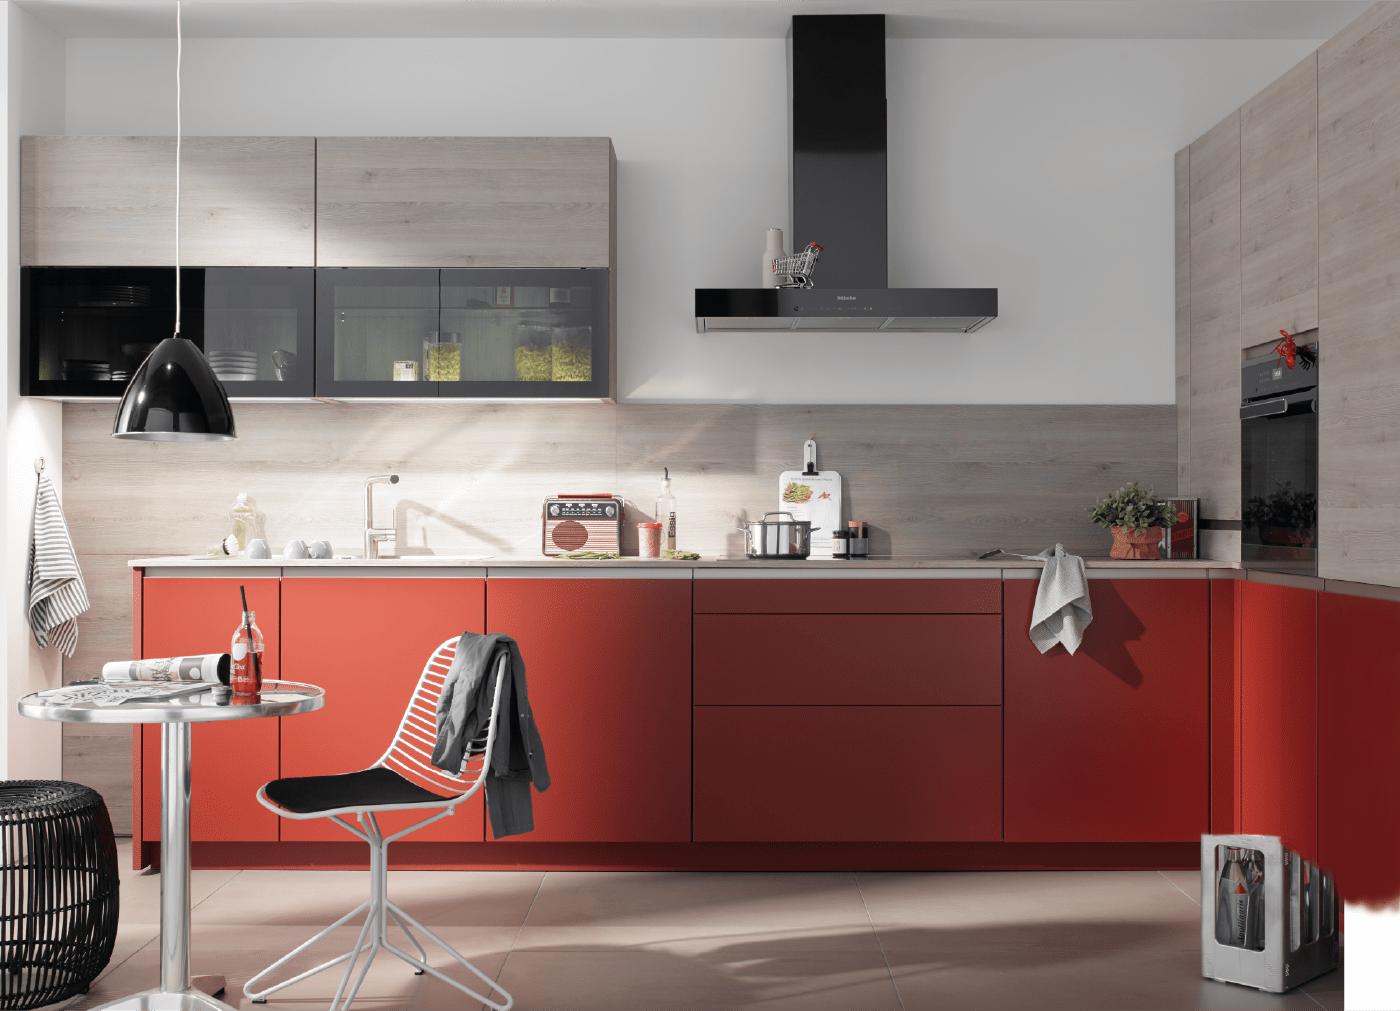 Cabeo-keukens-2-keuken-foto-7